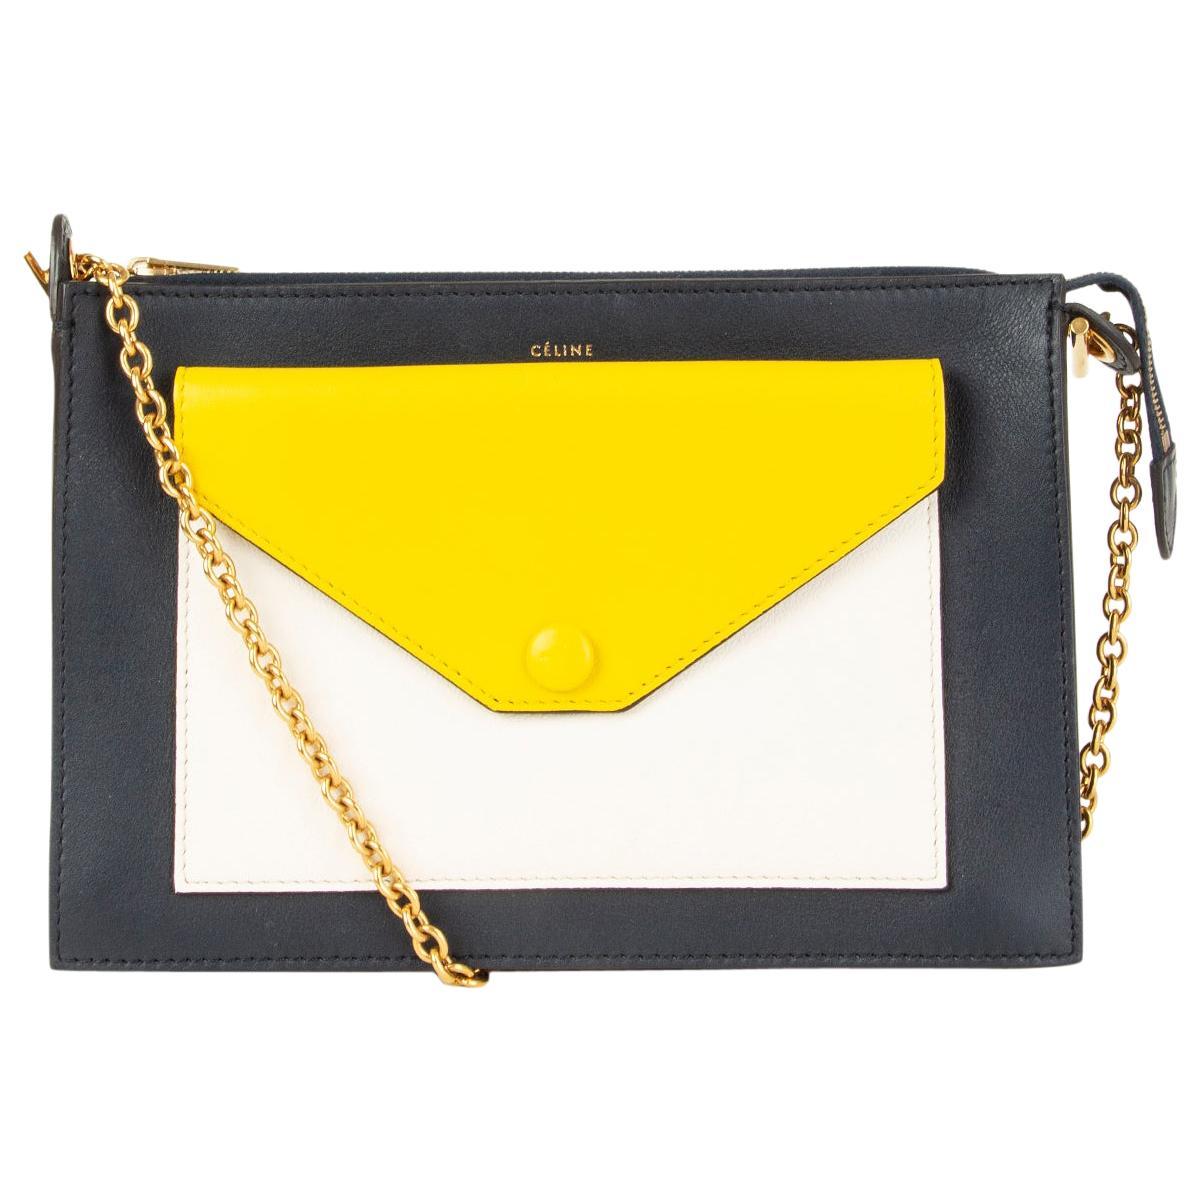 CELINE black yellow white leather POCKET MEDIUM CHAIN Clutch Bag